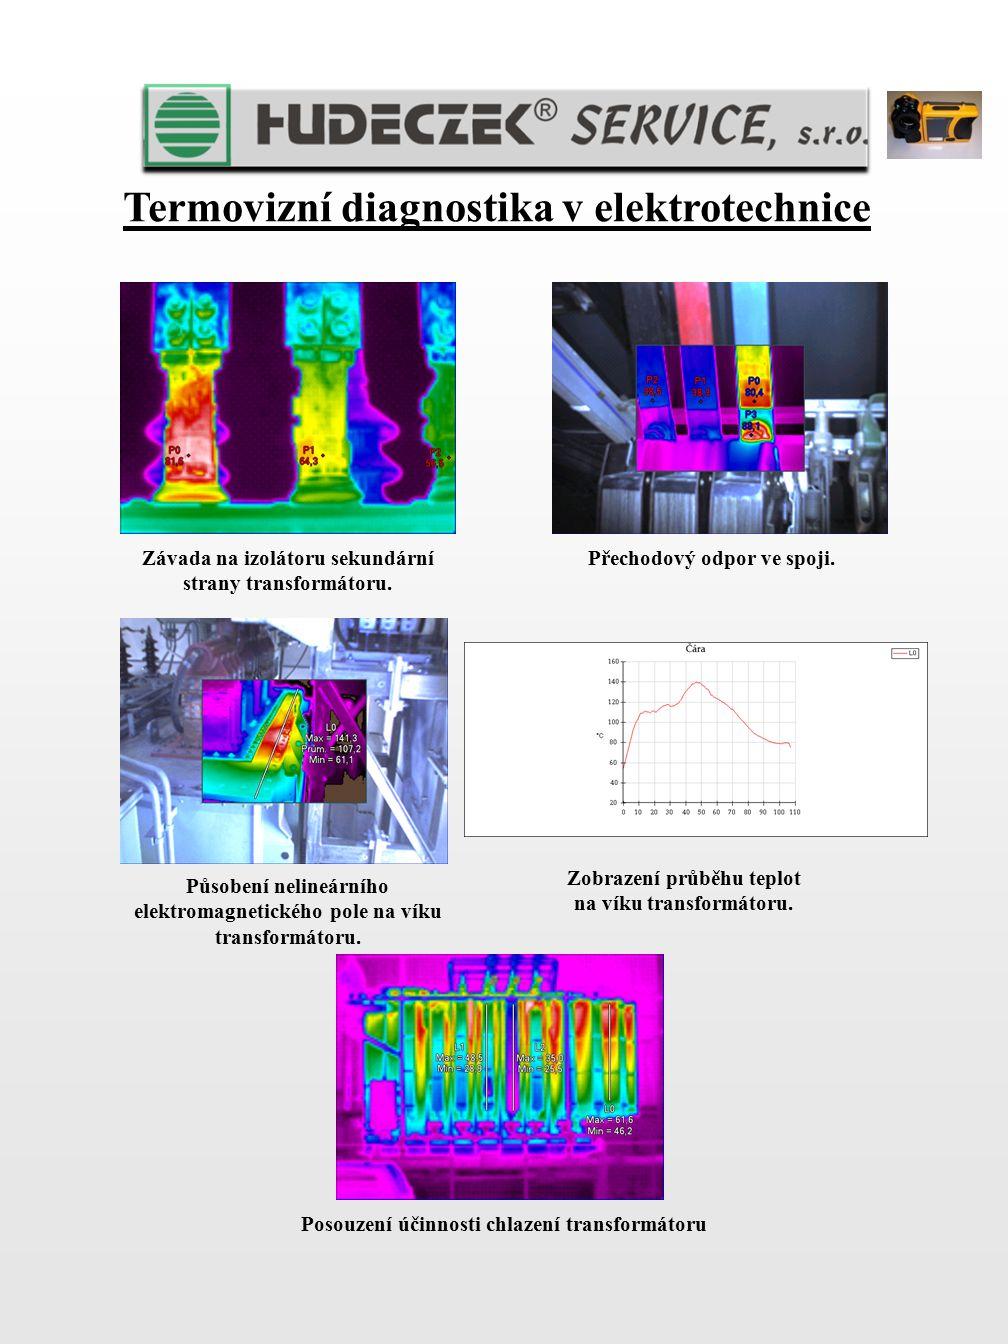 Termovizní diagnostika v elektrotechnice